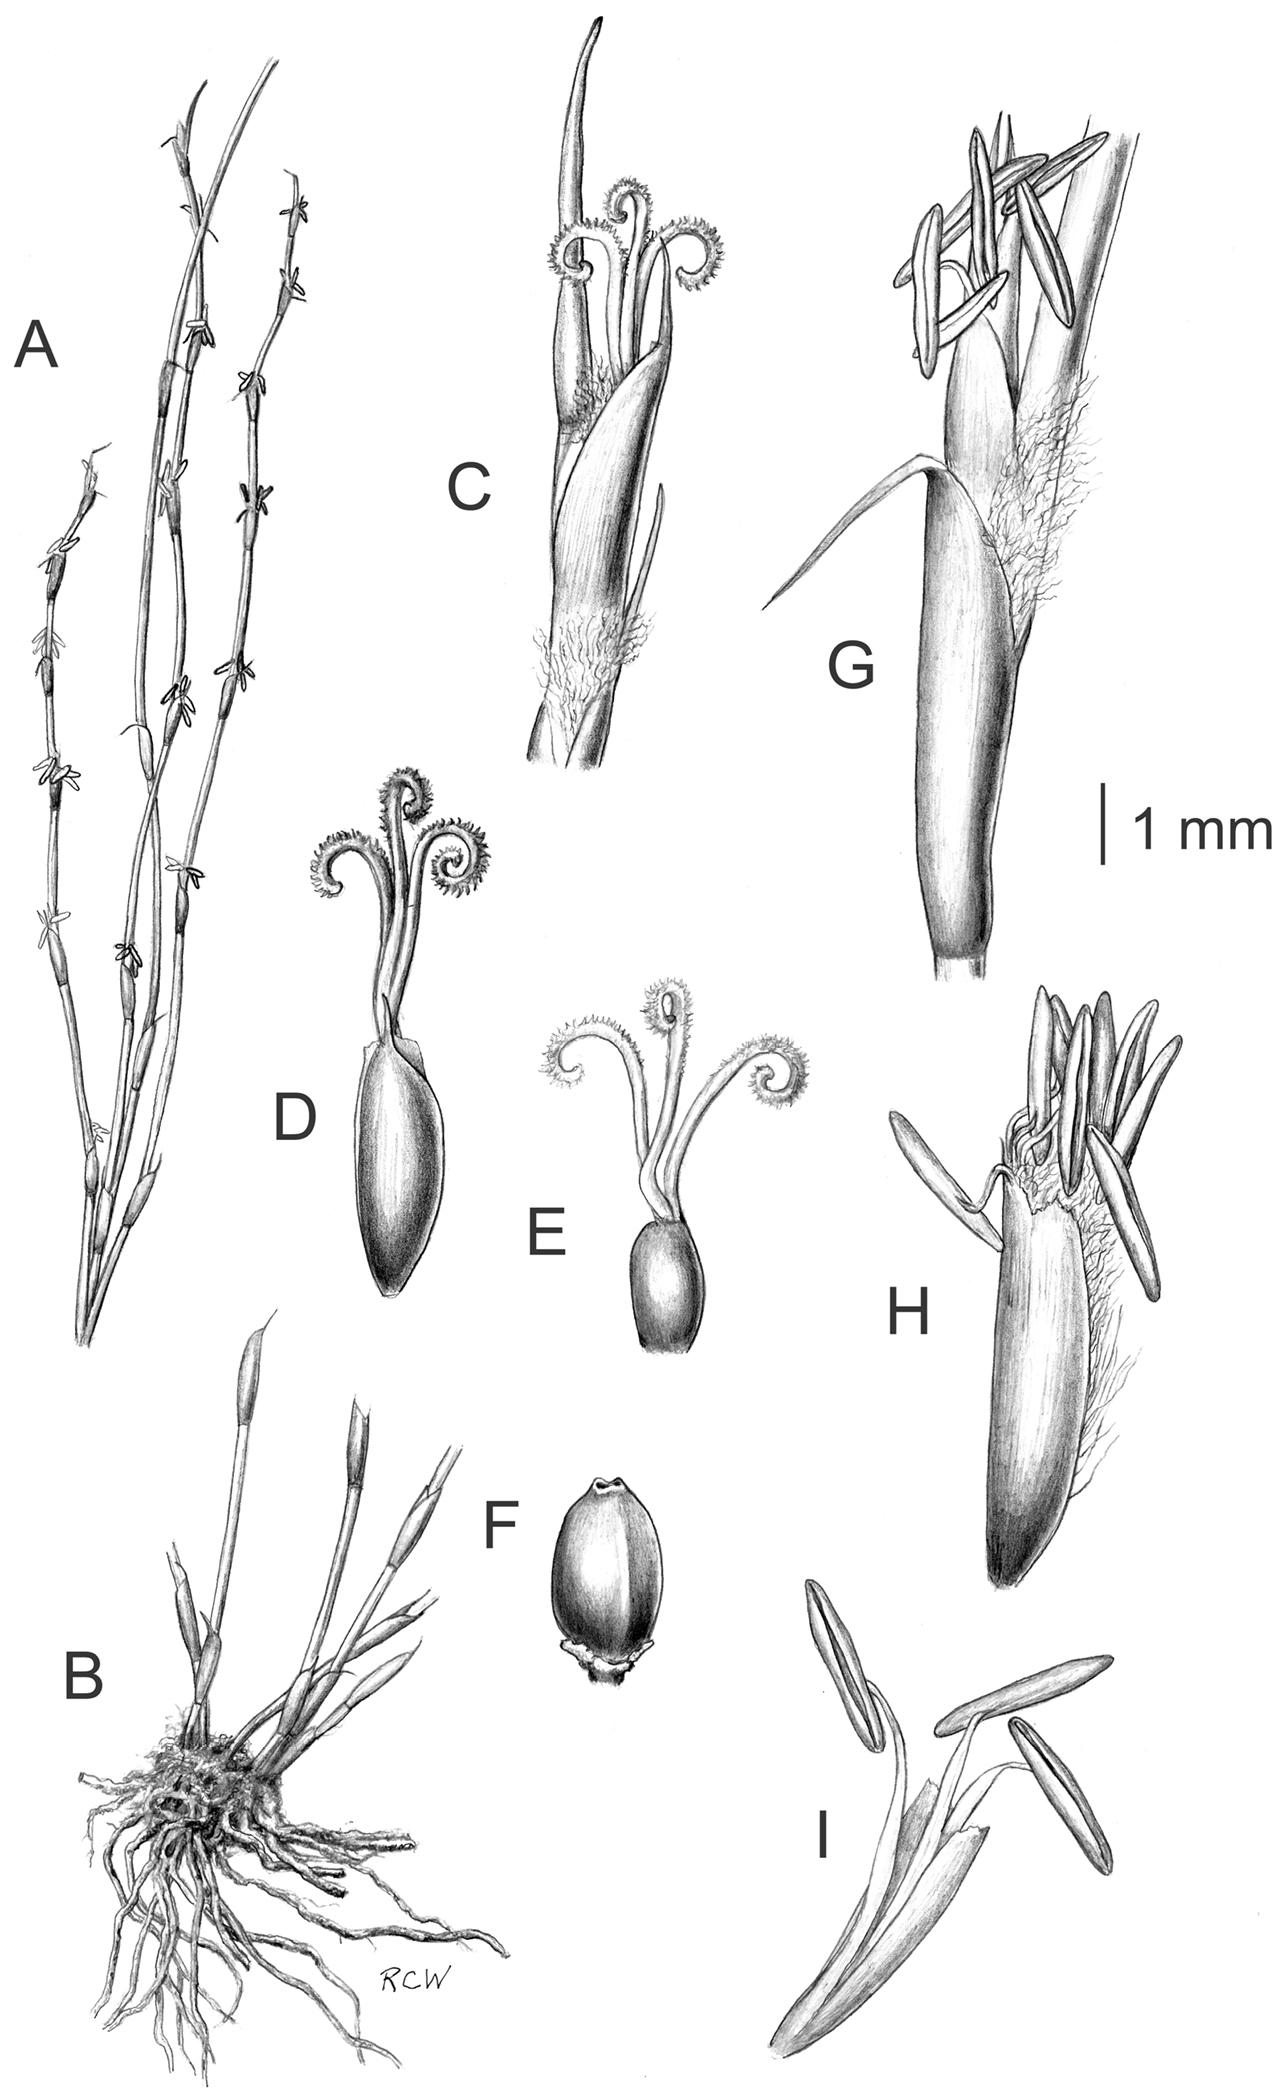 Systematics and ecology of the Australasian genus Empodisma